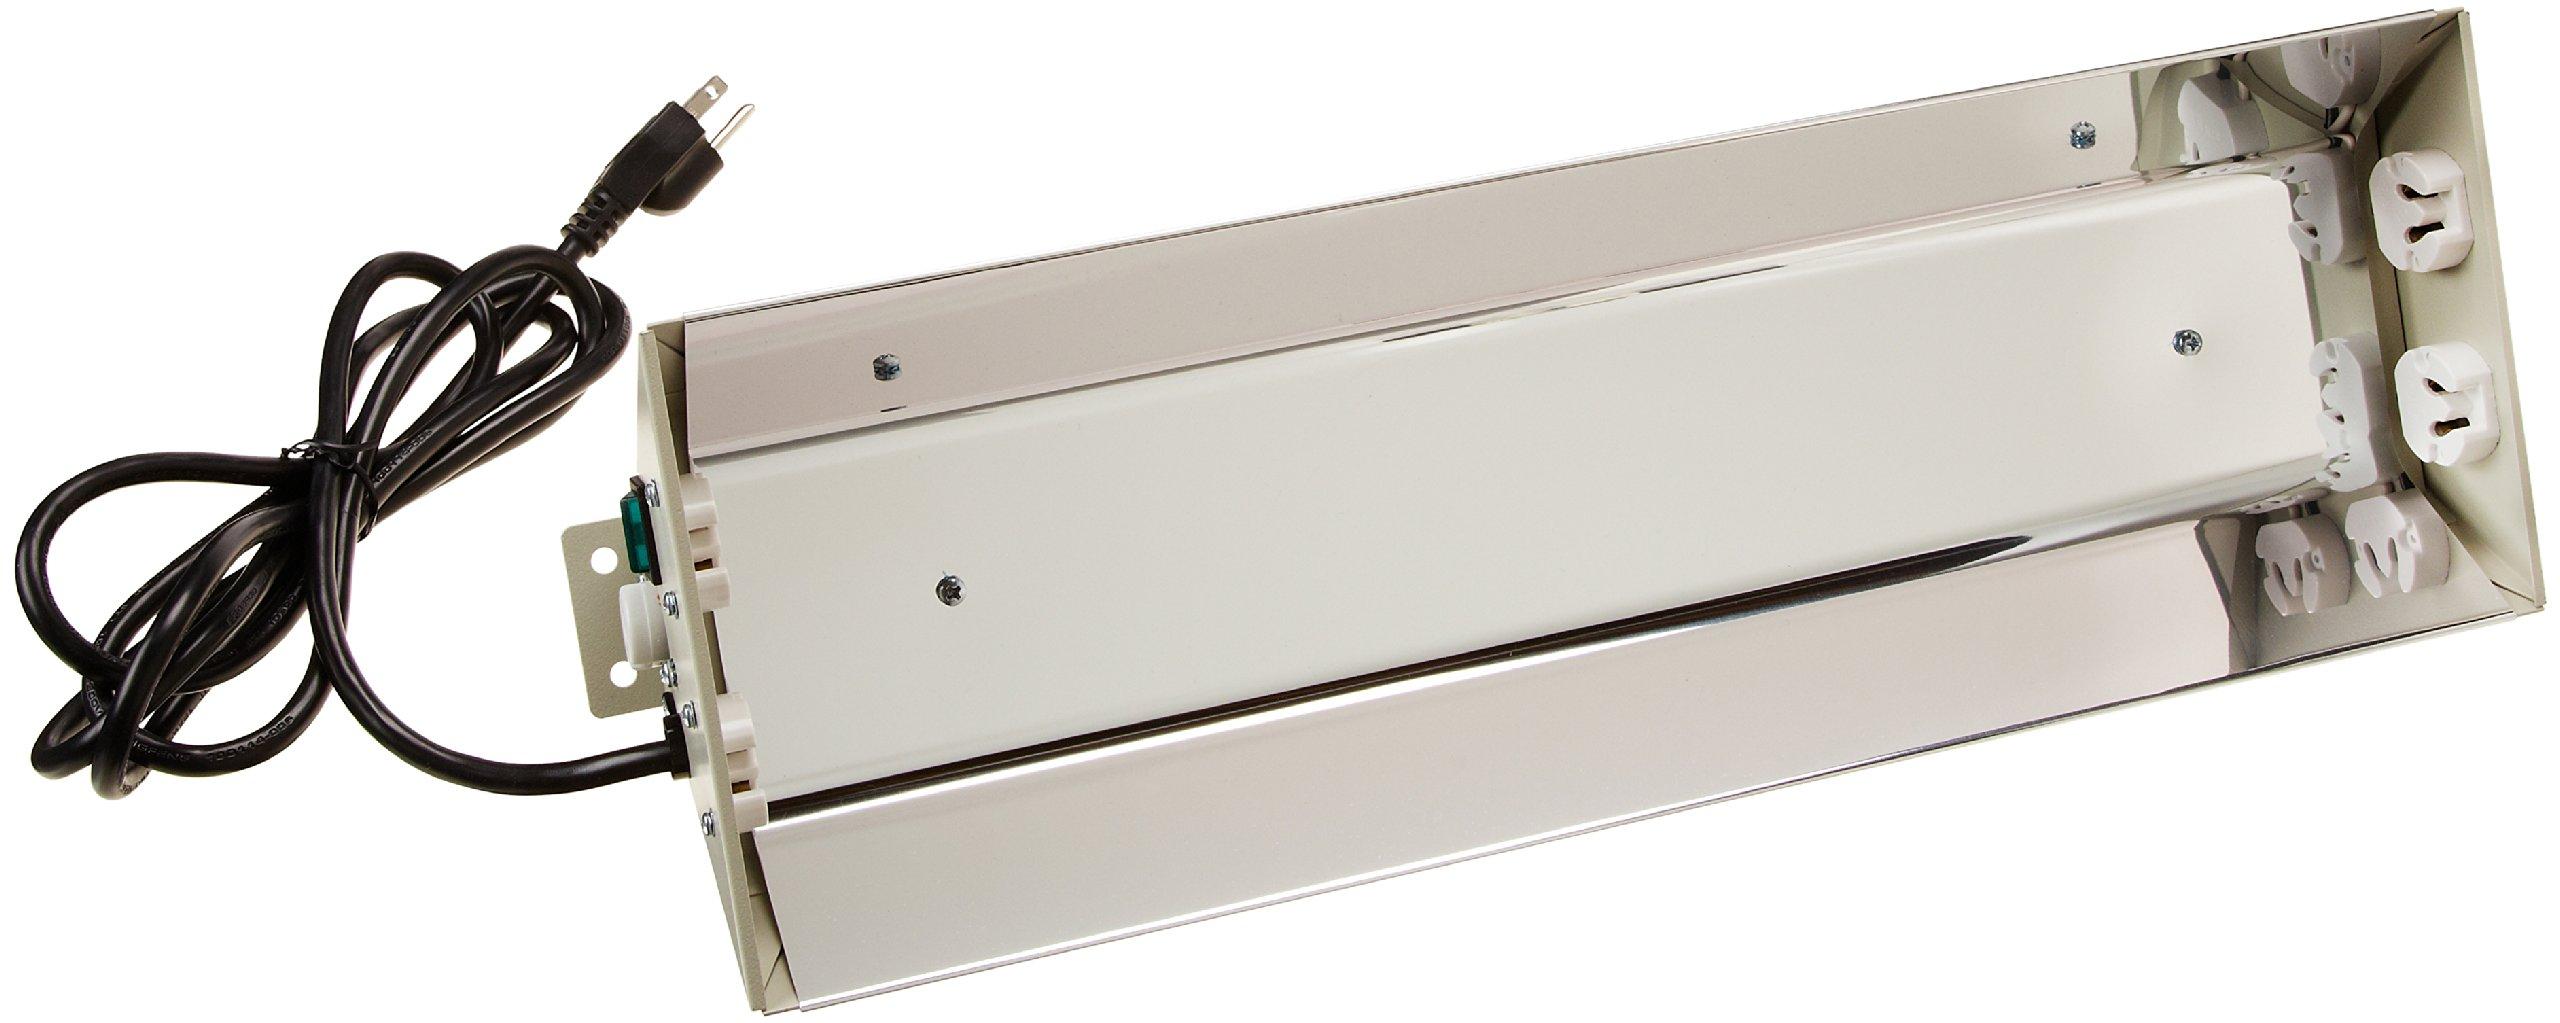 UVP 95-0042-03 Model XX-15 XX-Series 15 Watt UV Bench Lamp, Fixture, 115V